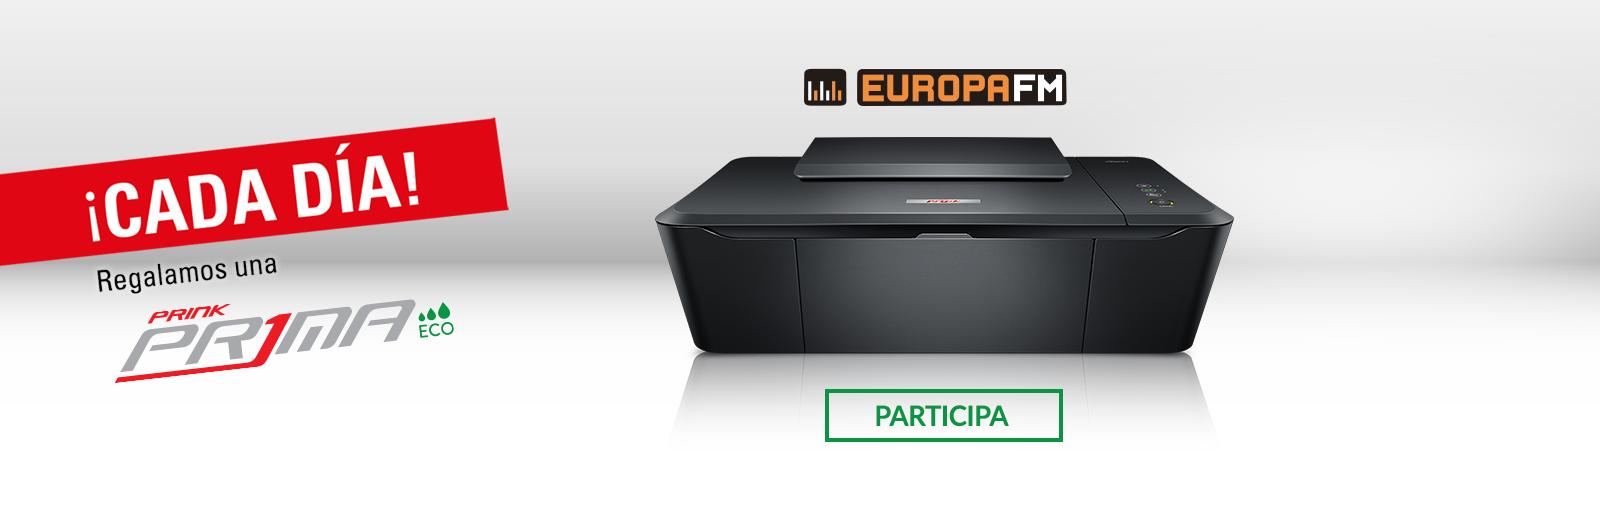 Slider_web_EUROPAFM_ECO